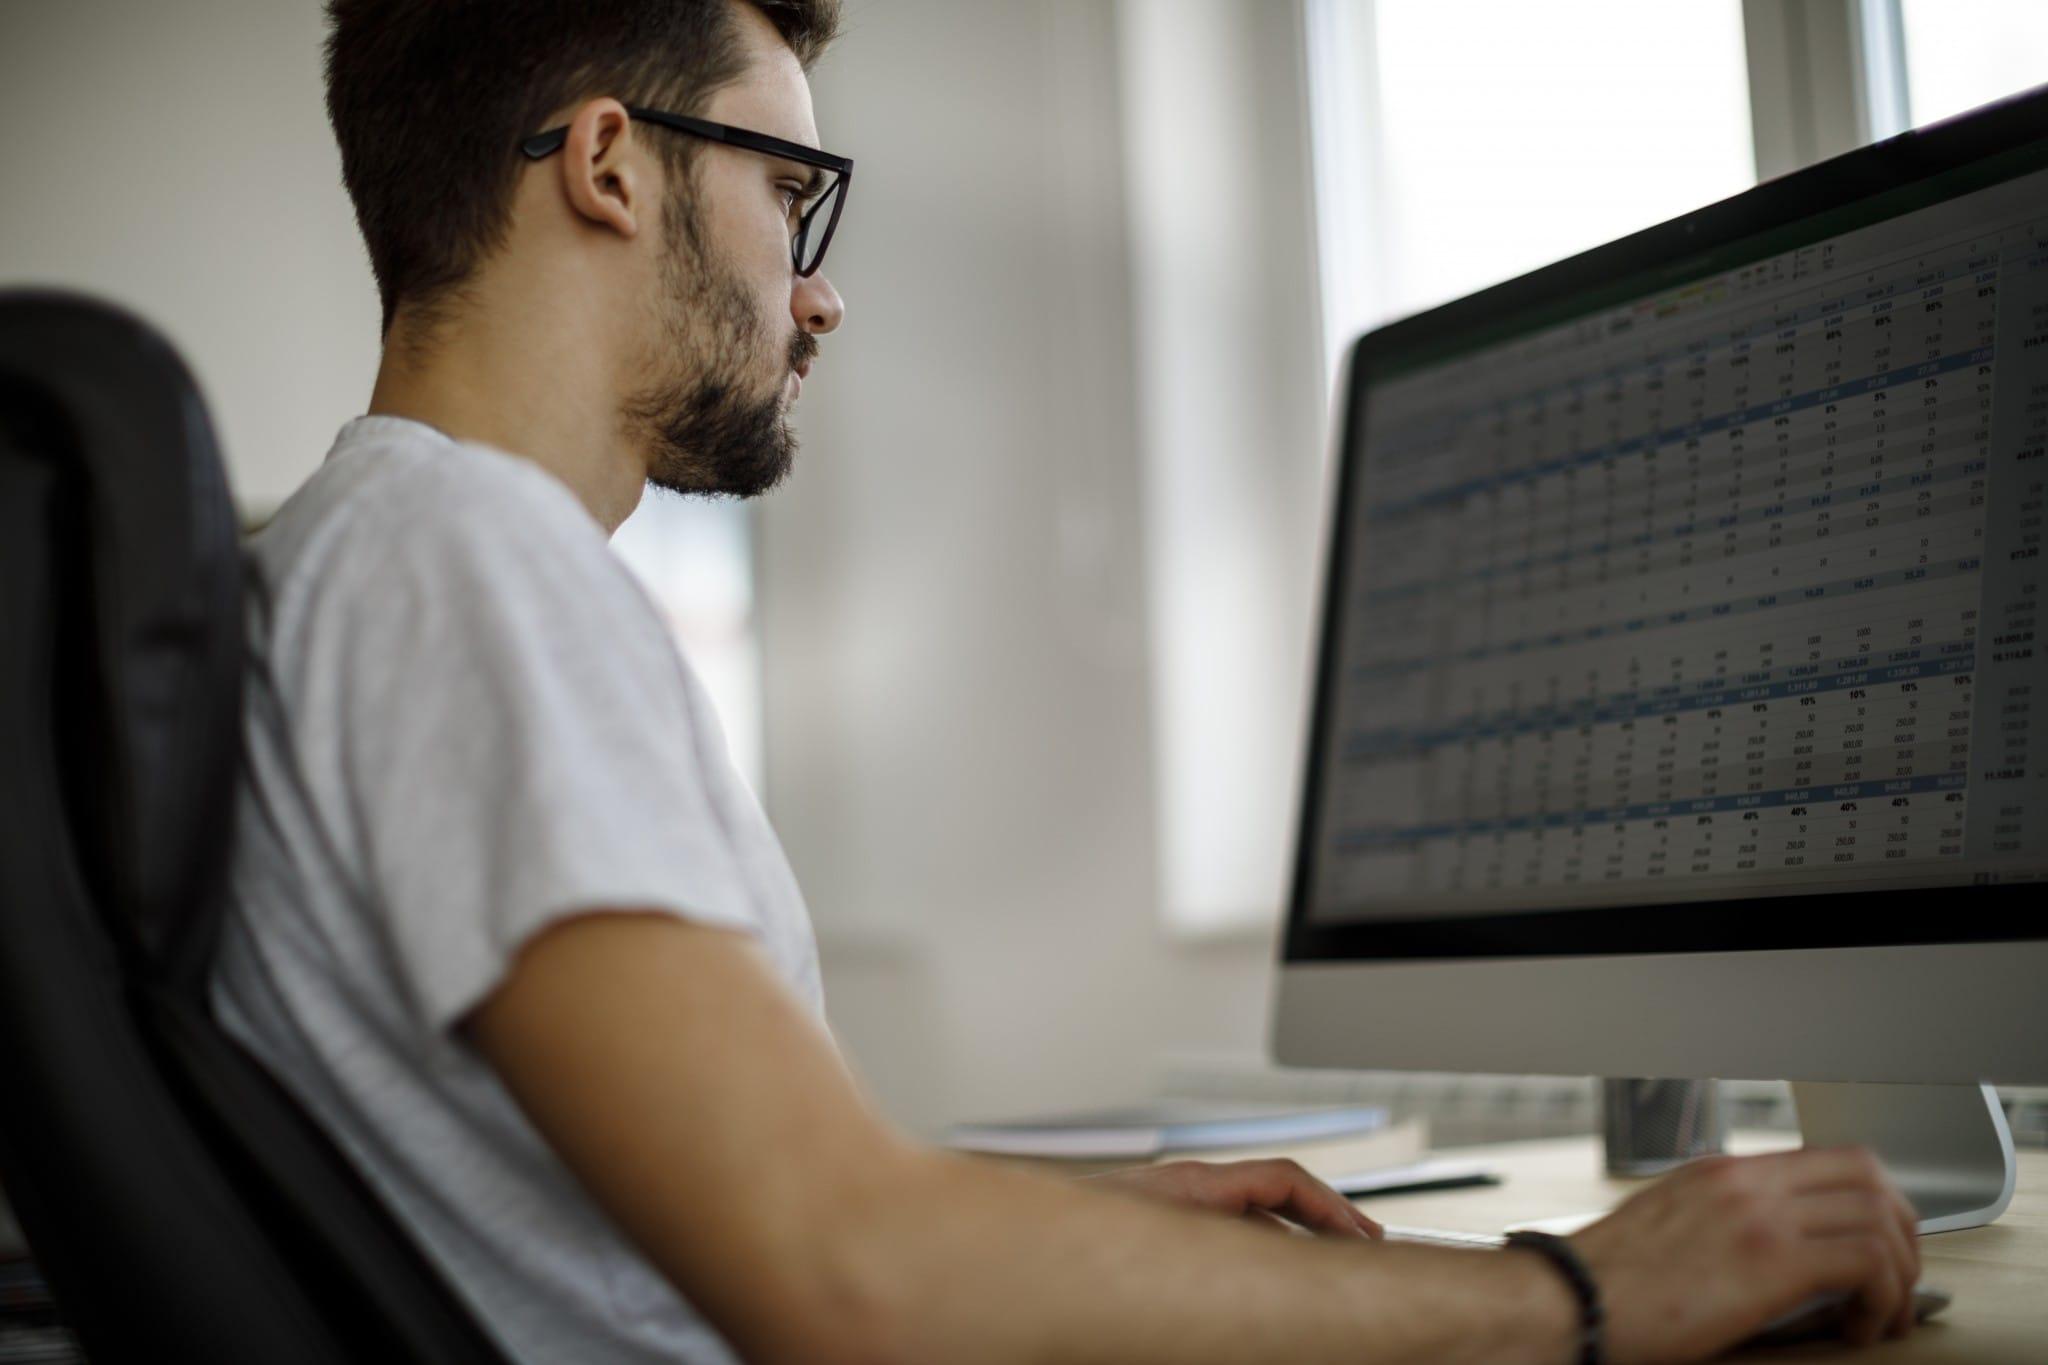 A man works on a spreadsheet at a desktop computer.